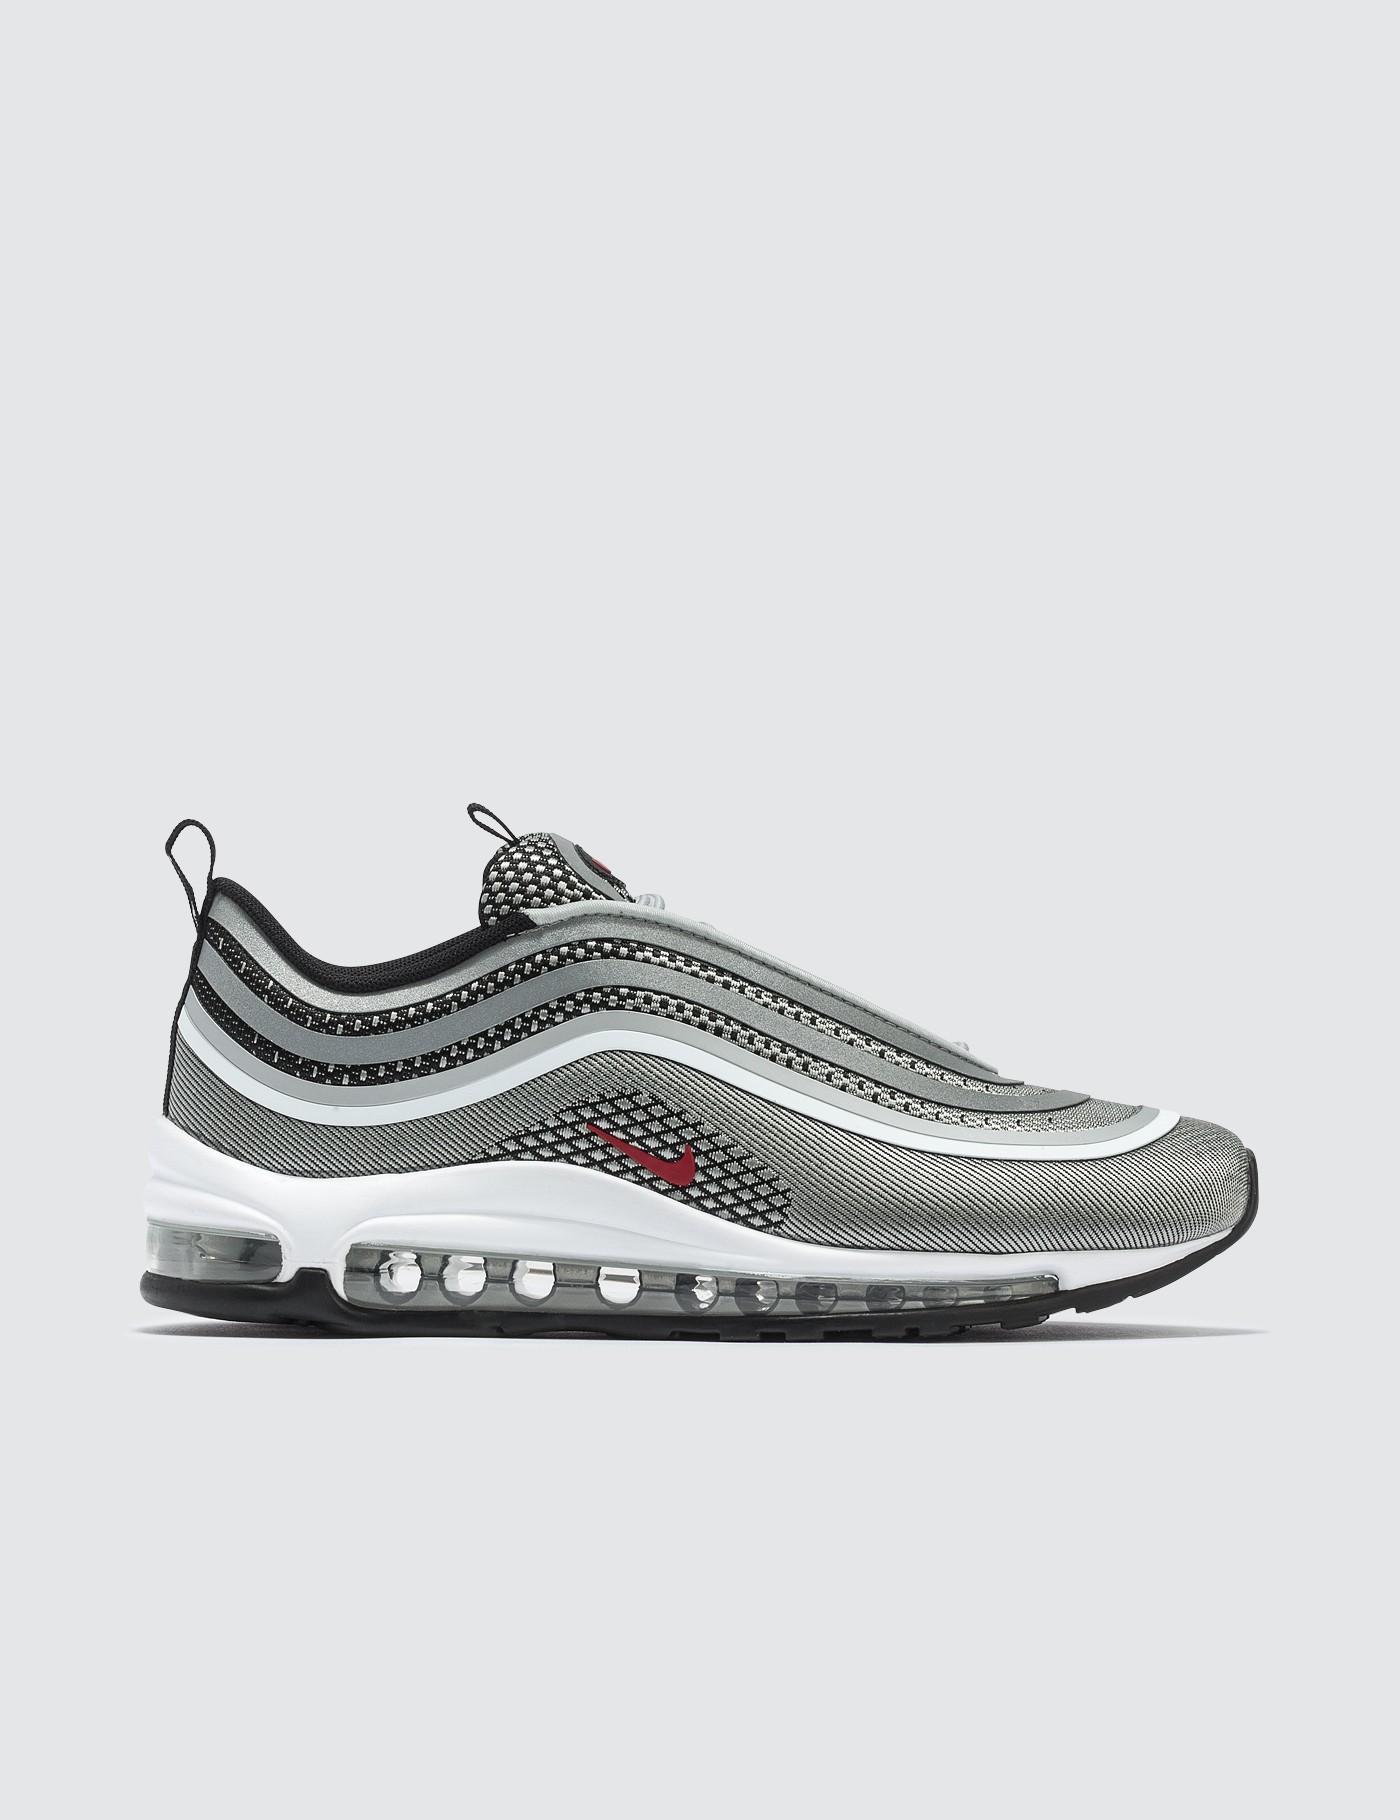 d69ddc0983 Lyst - Nike Air Max 97 Ultra 17 Silver Bullet Sneaker in Metallic ...